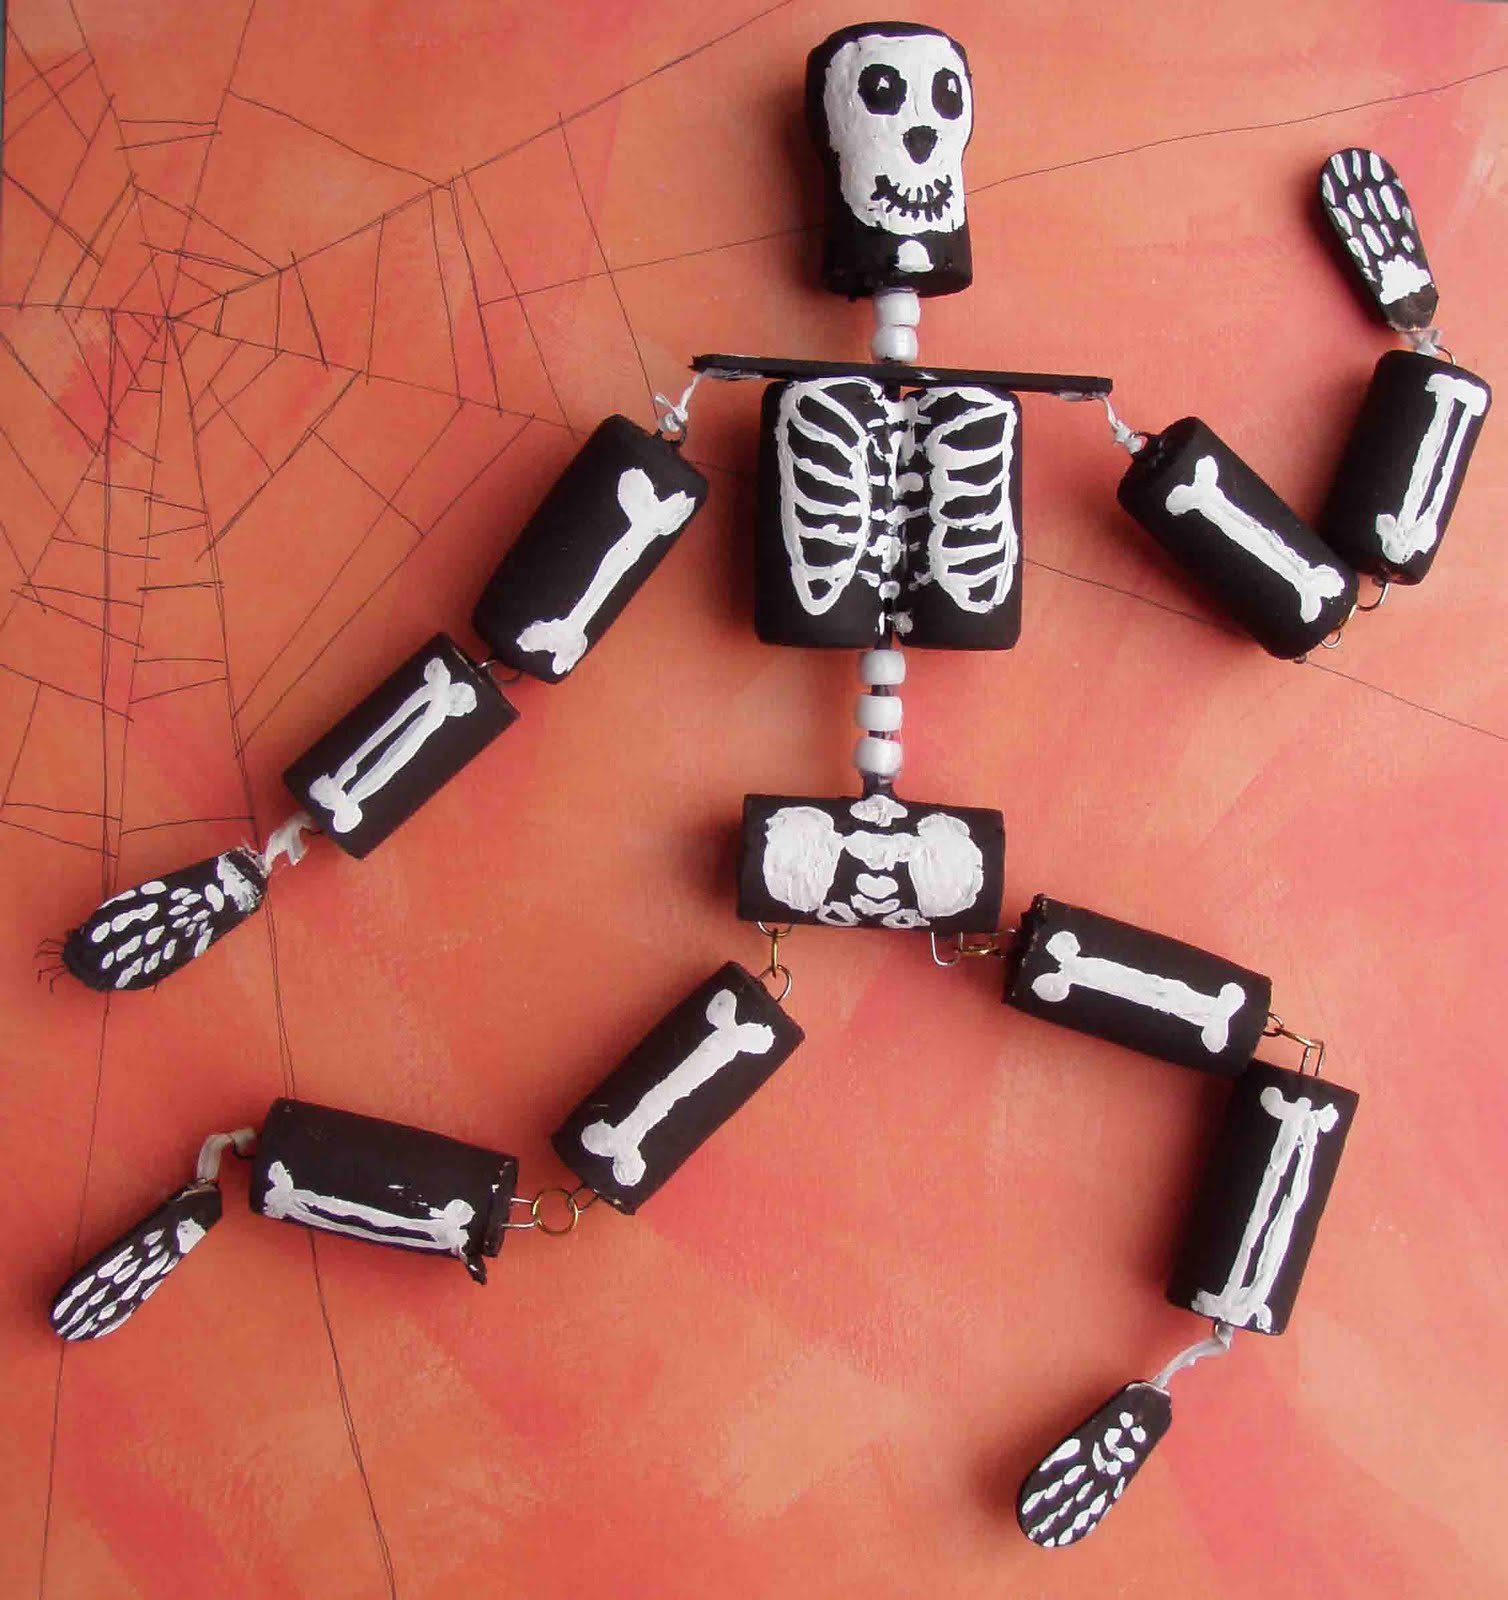 Crack of dawn crafts halloween craft cork skeleton for Crafts with wine bottle corks